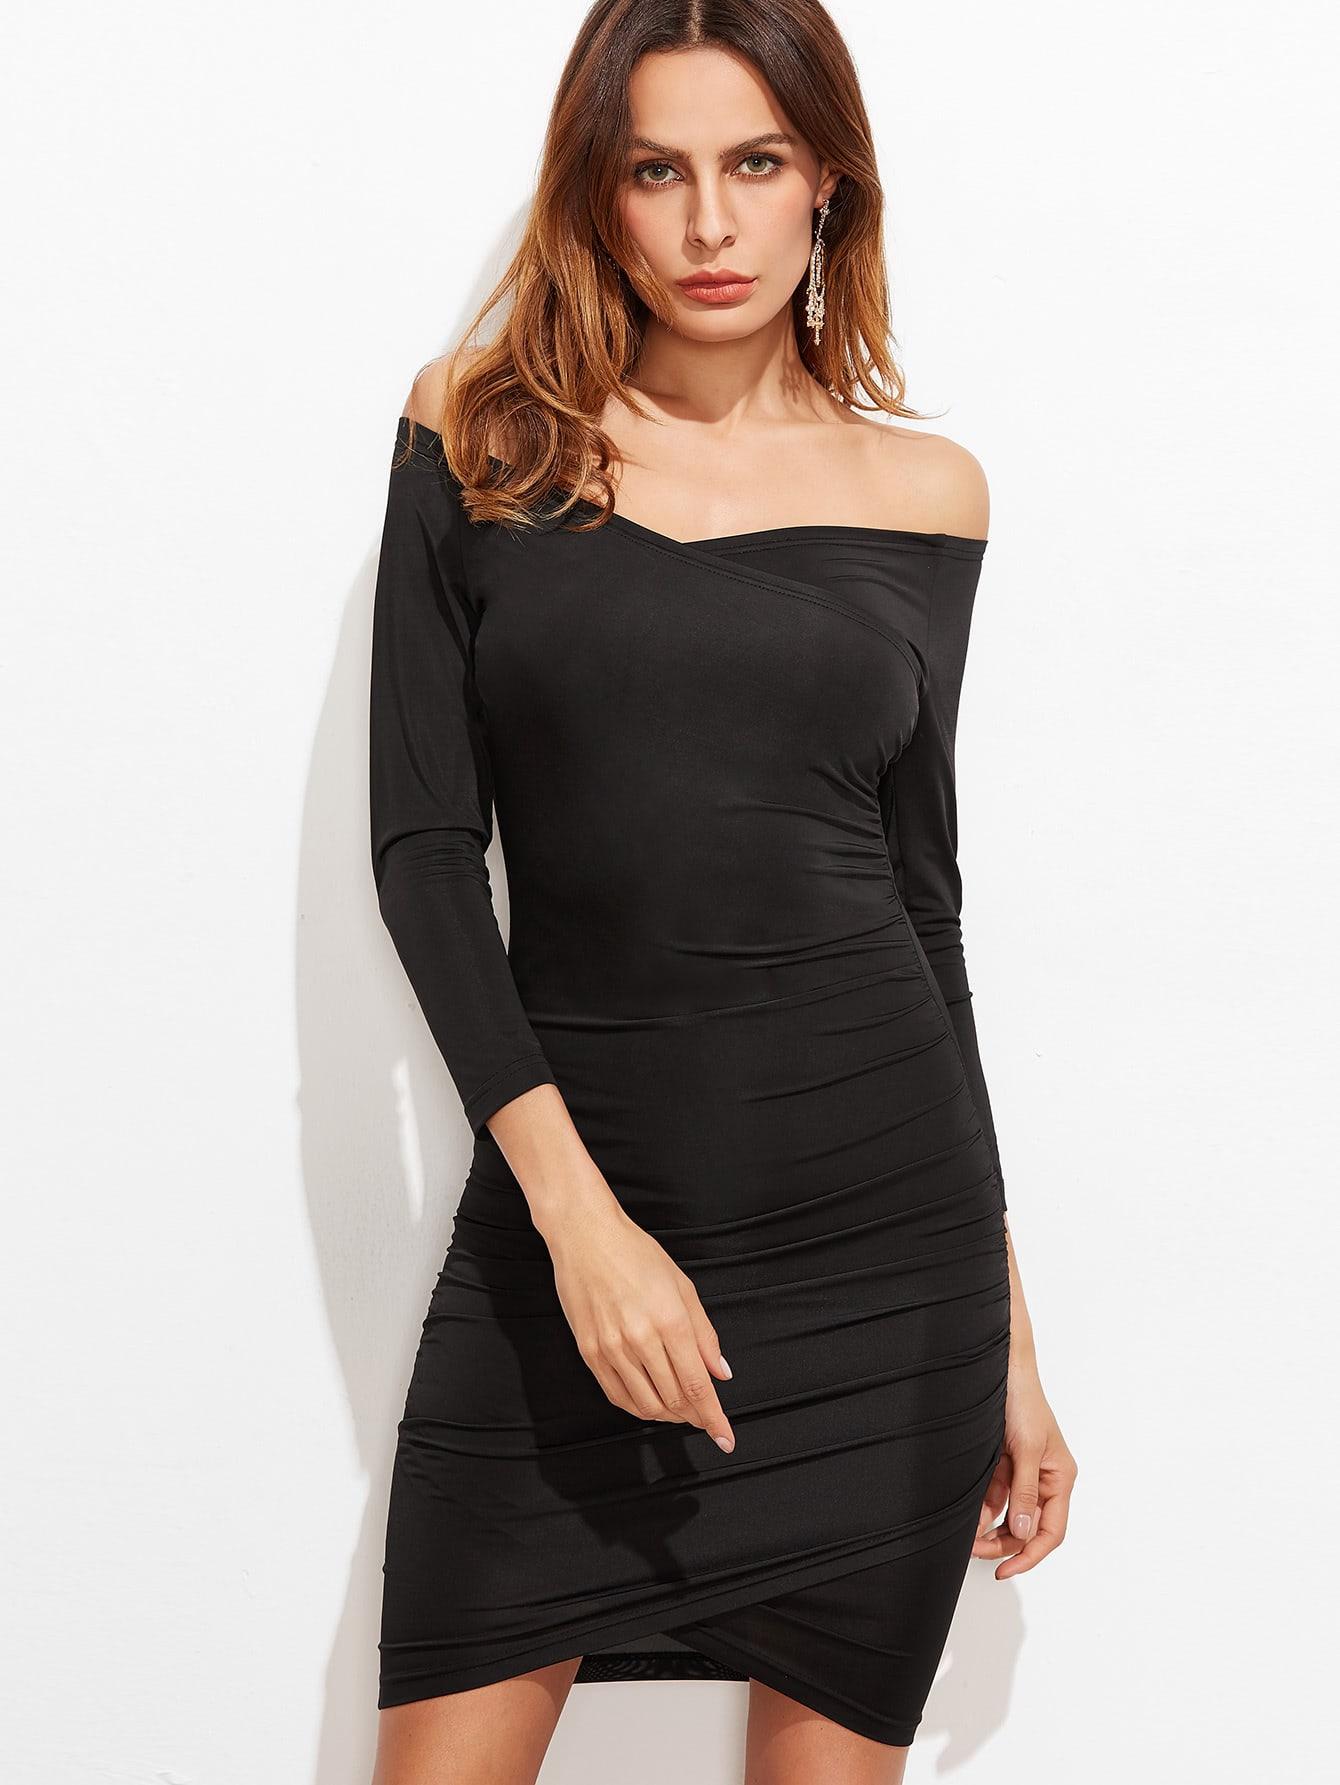 Black Off The Shoulder Ruched Overlap Bodycon Dress